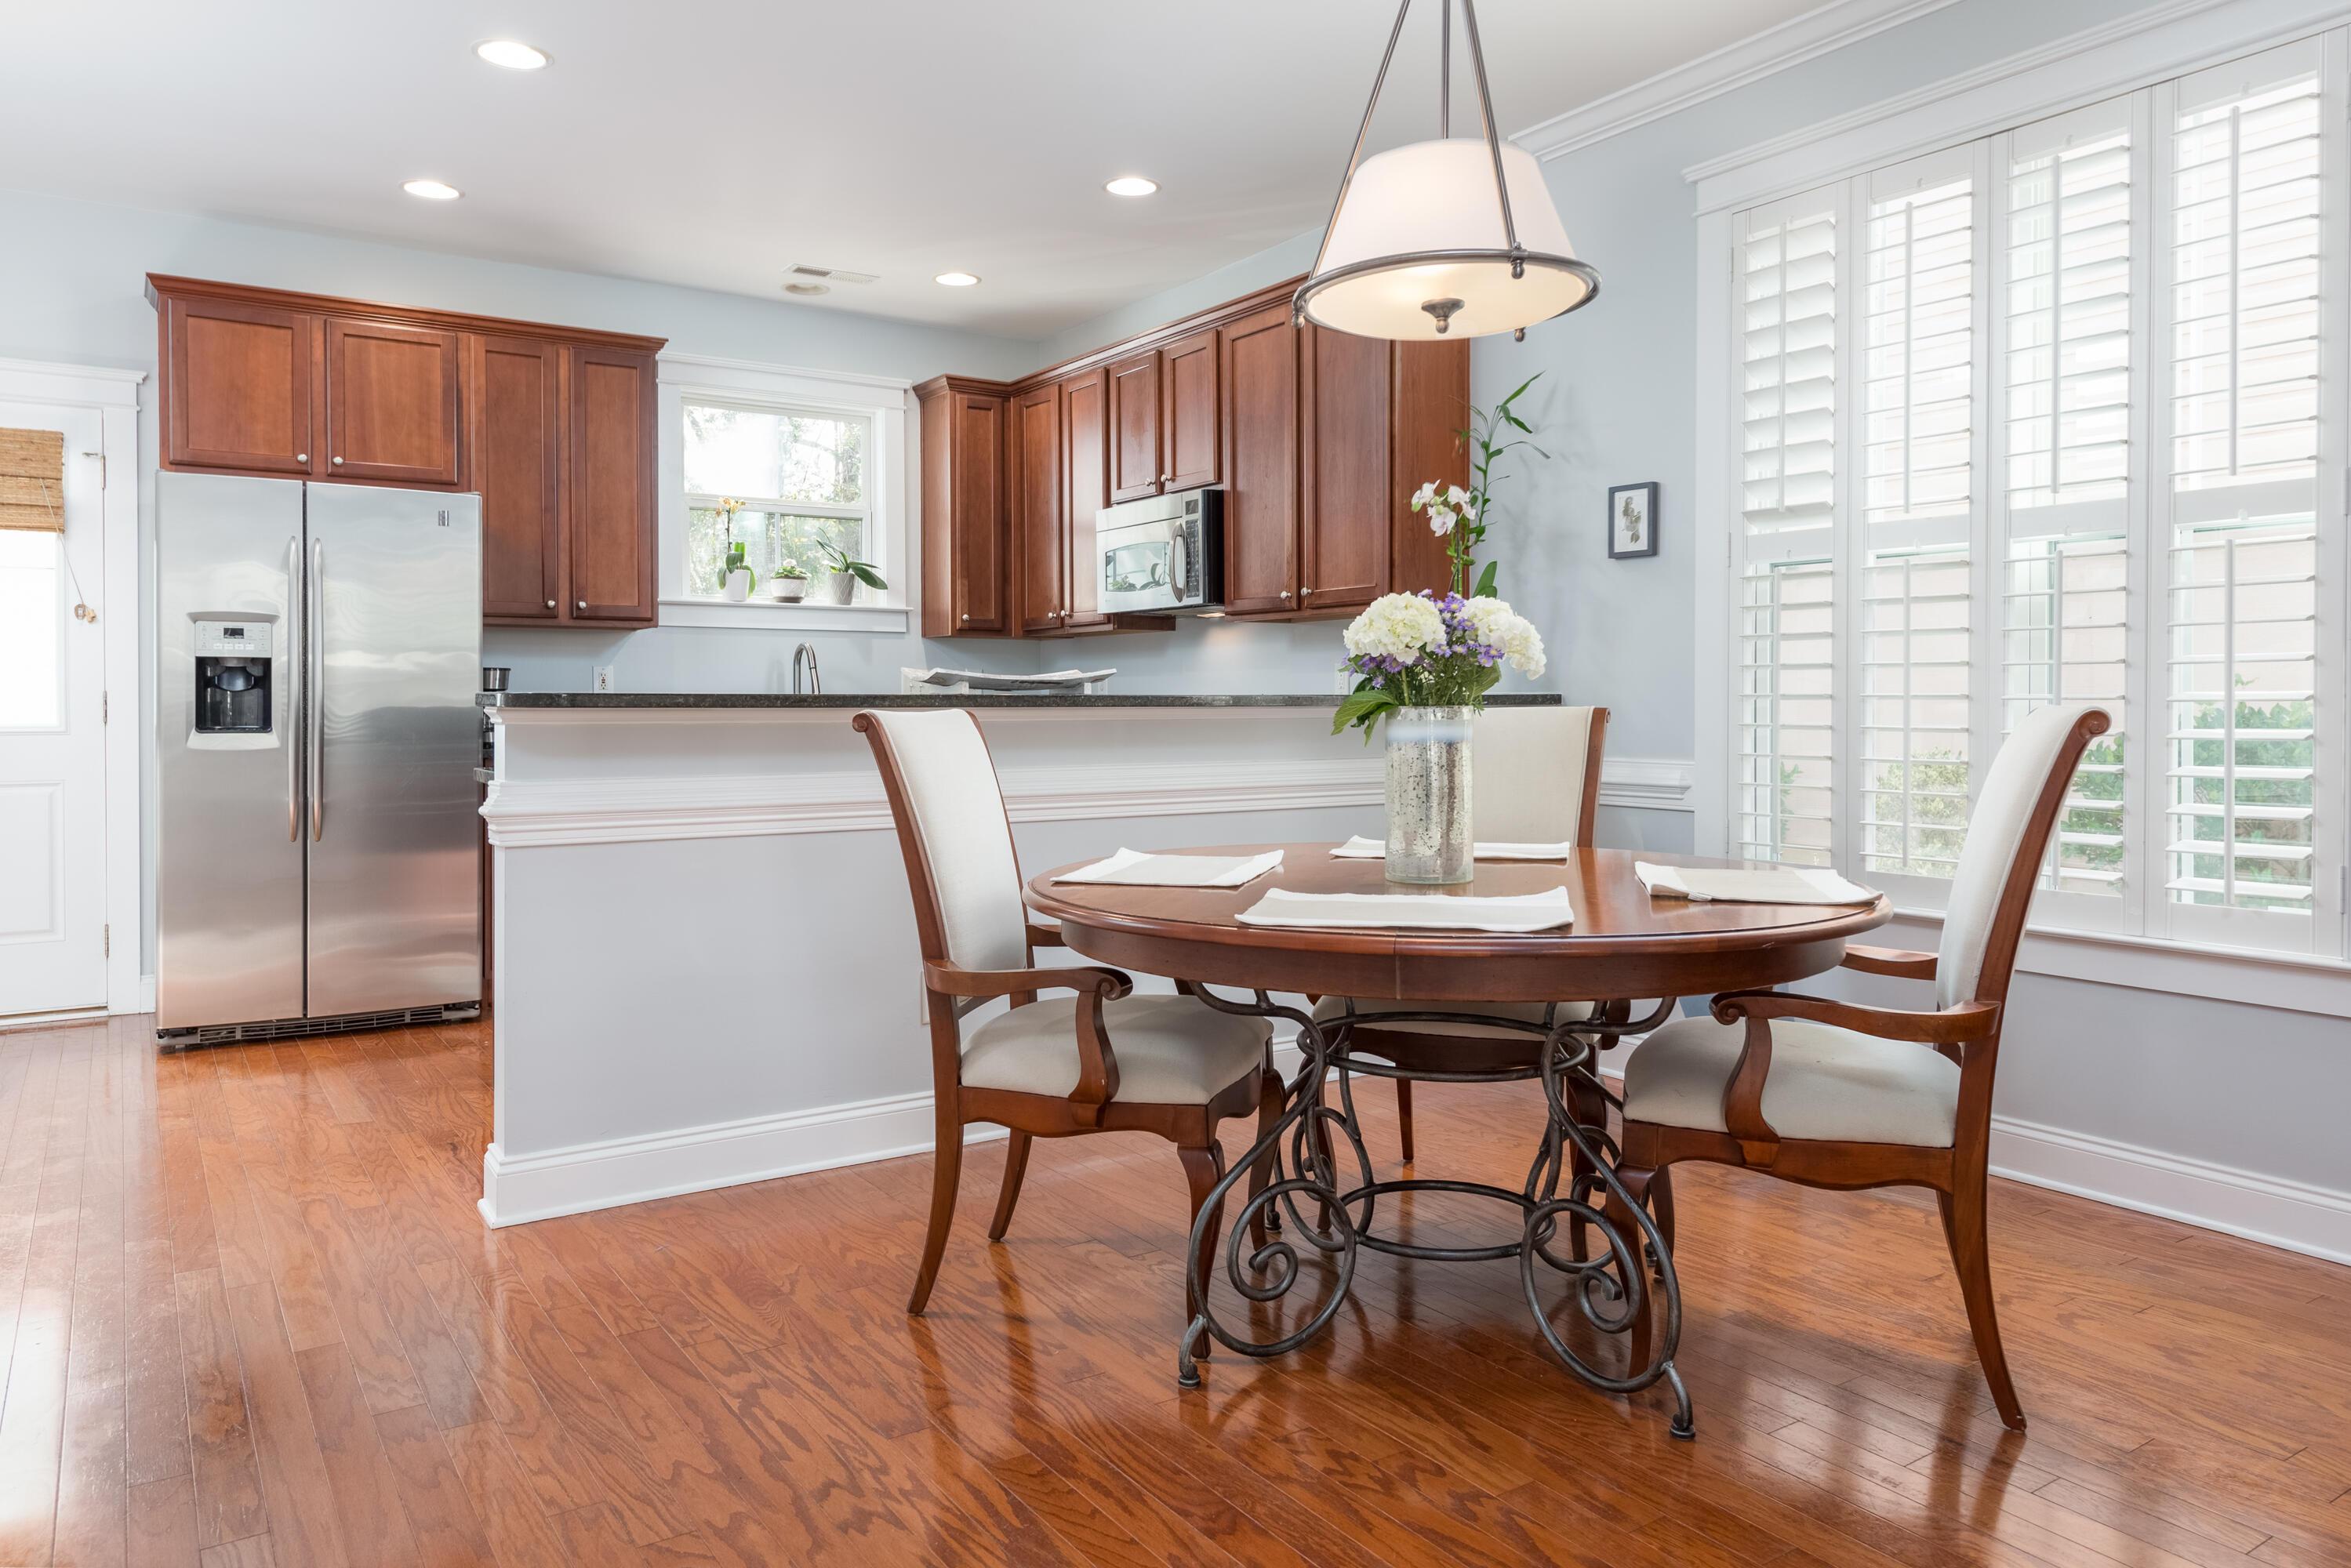 Carol Oaks Homes For Sale - 2813 Caitlins, Mount Pleasant, SC - 14